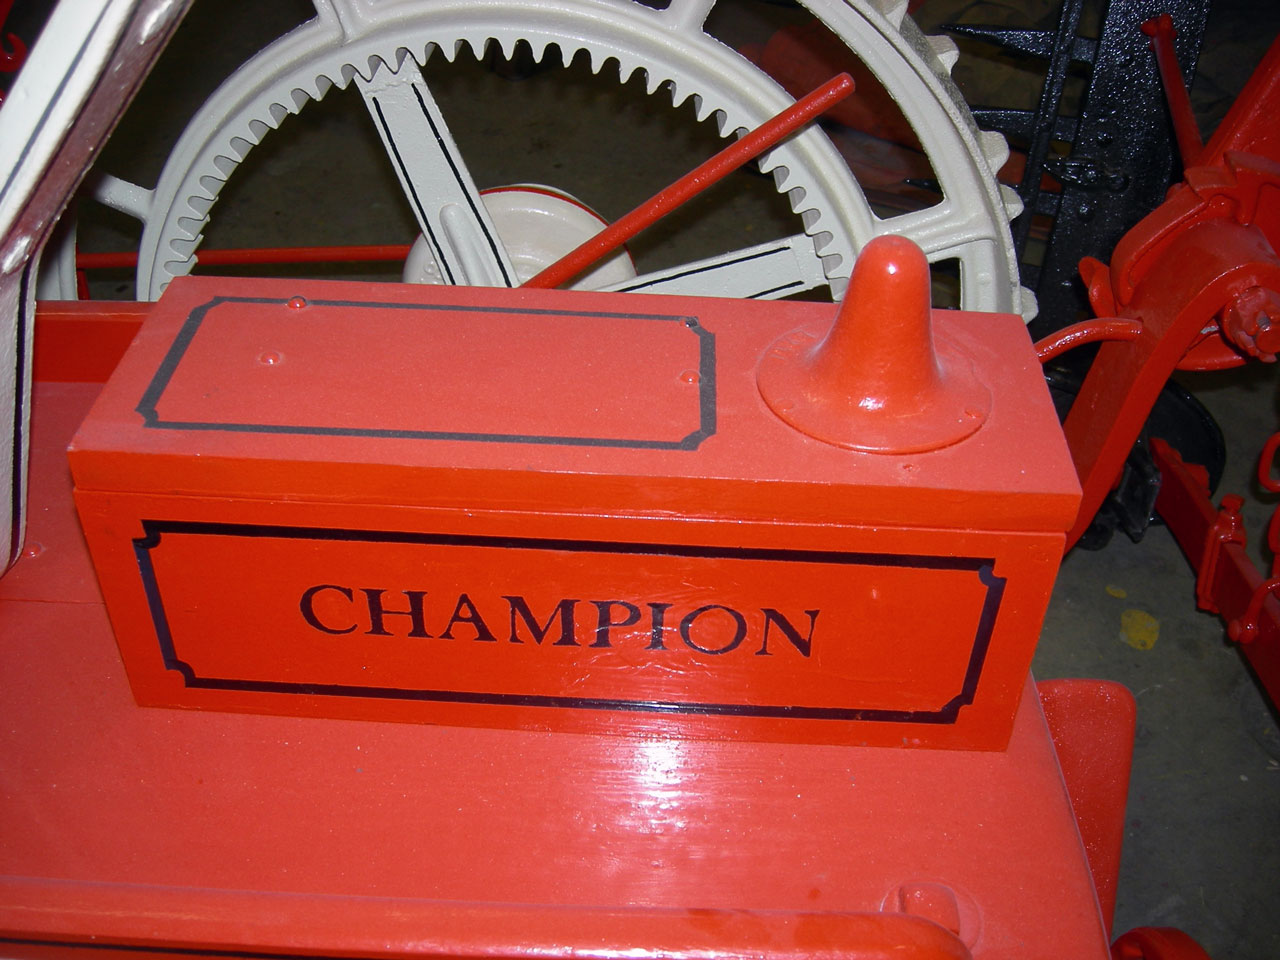 Champion No.4 Mower Reaper